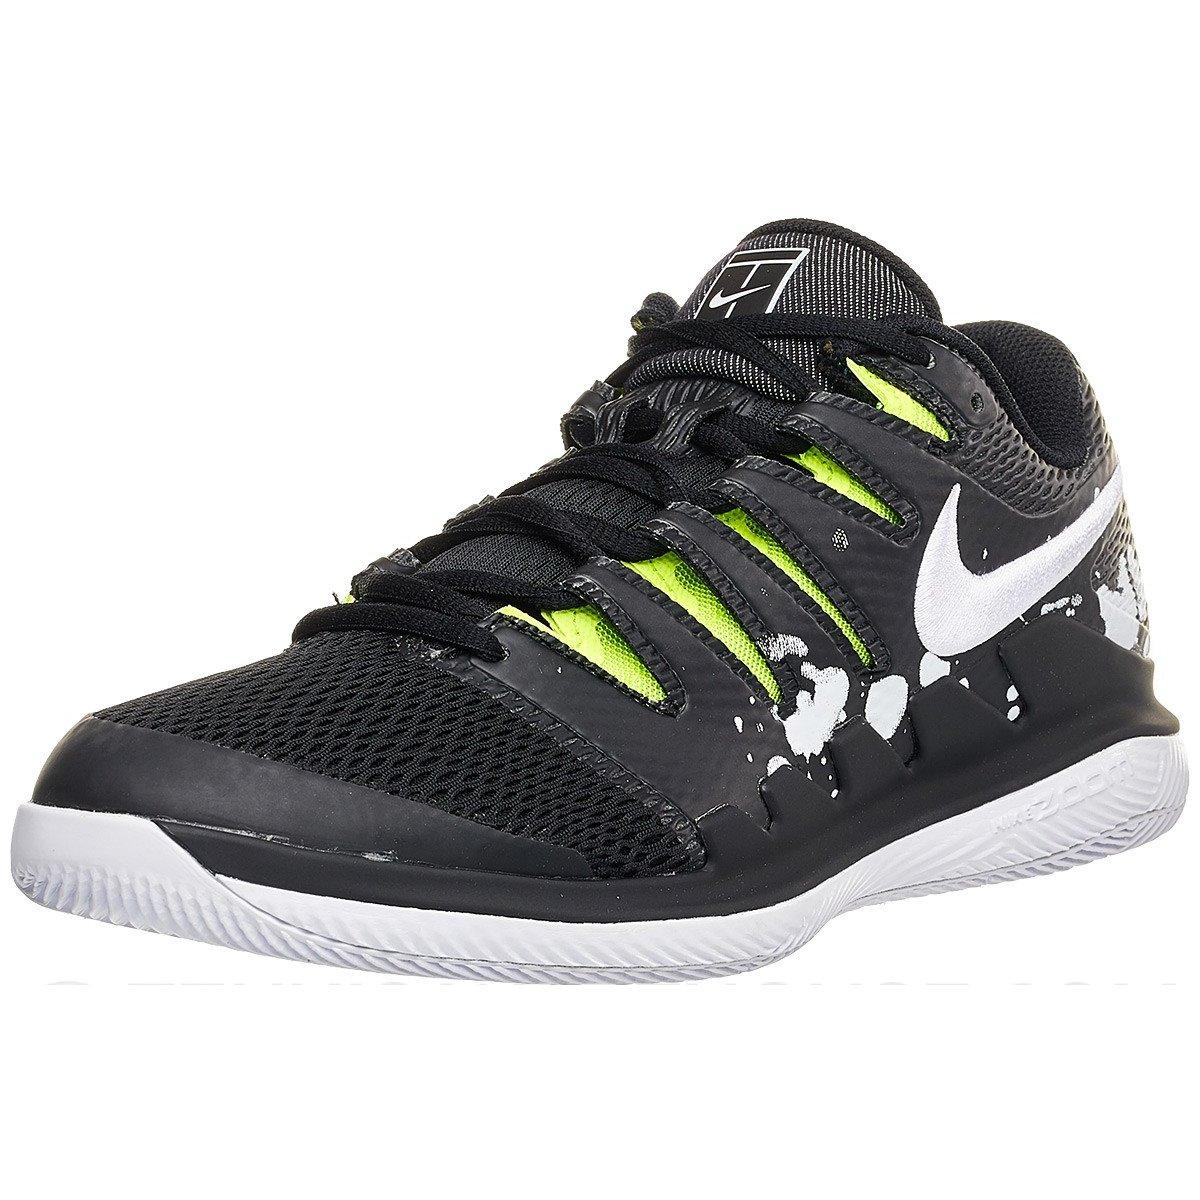 Nike Air Zoom Vapor X PRM Black/White Men's Shoes